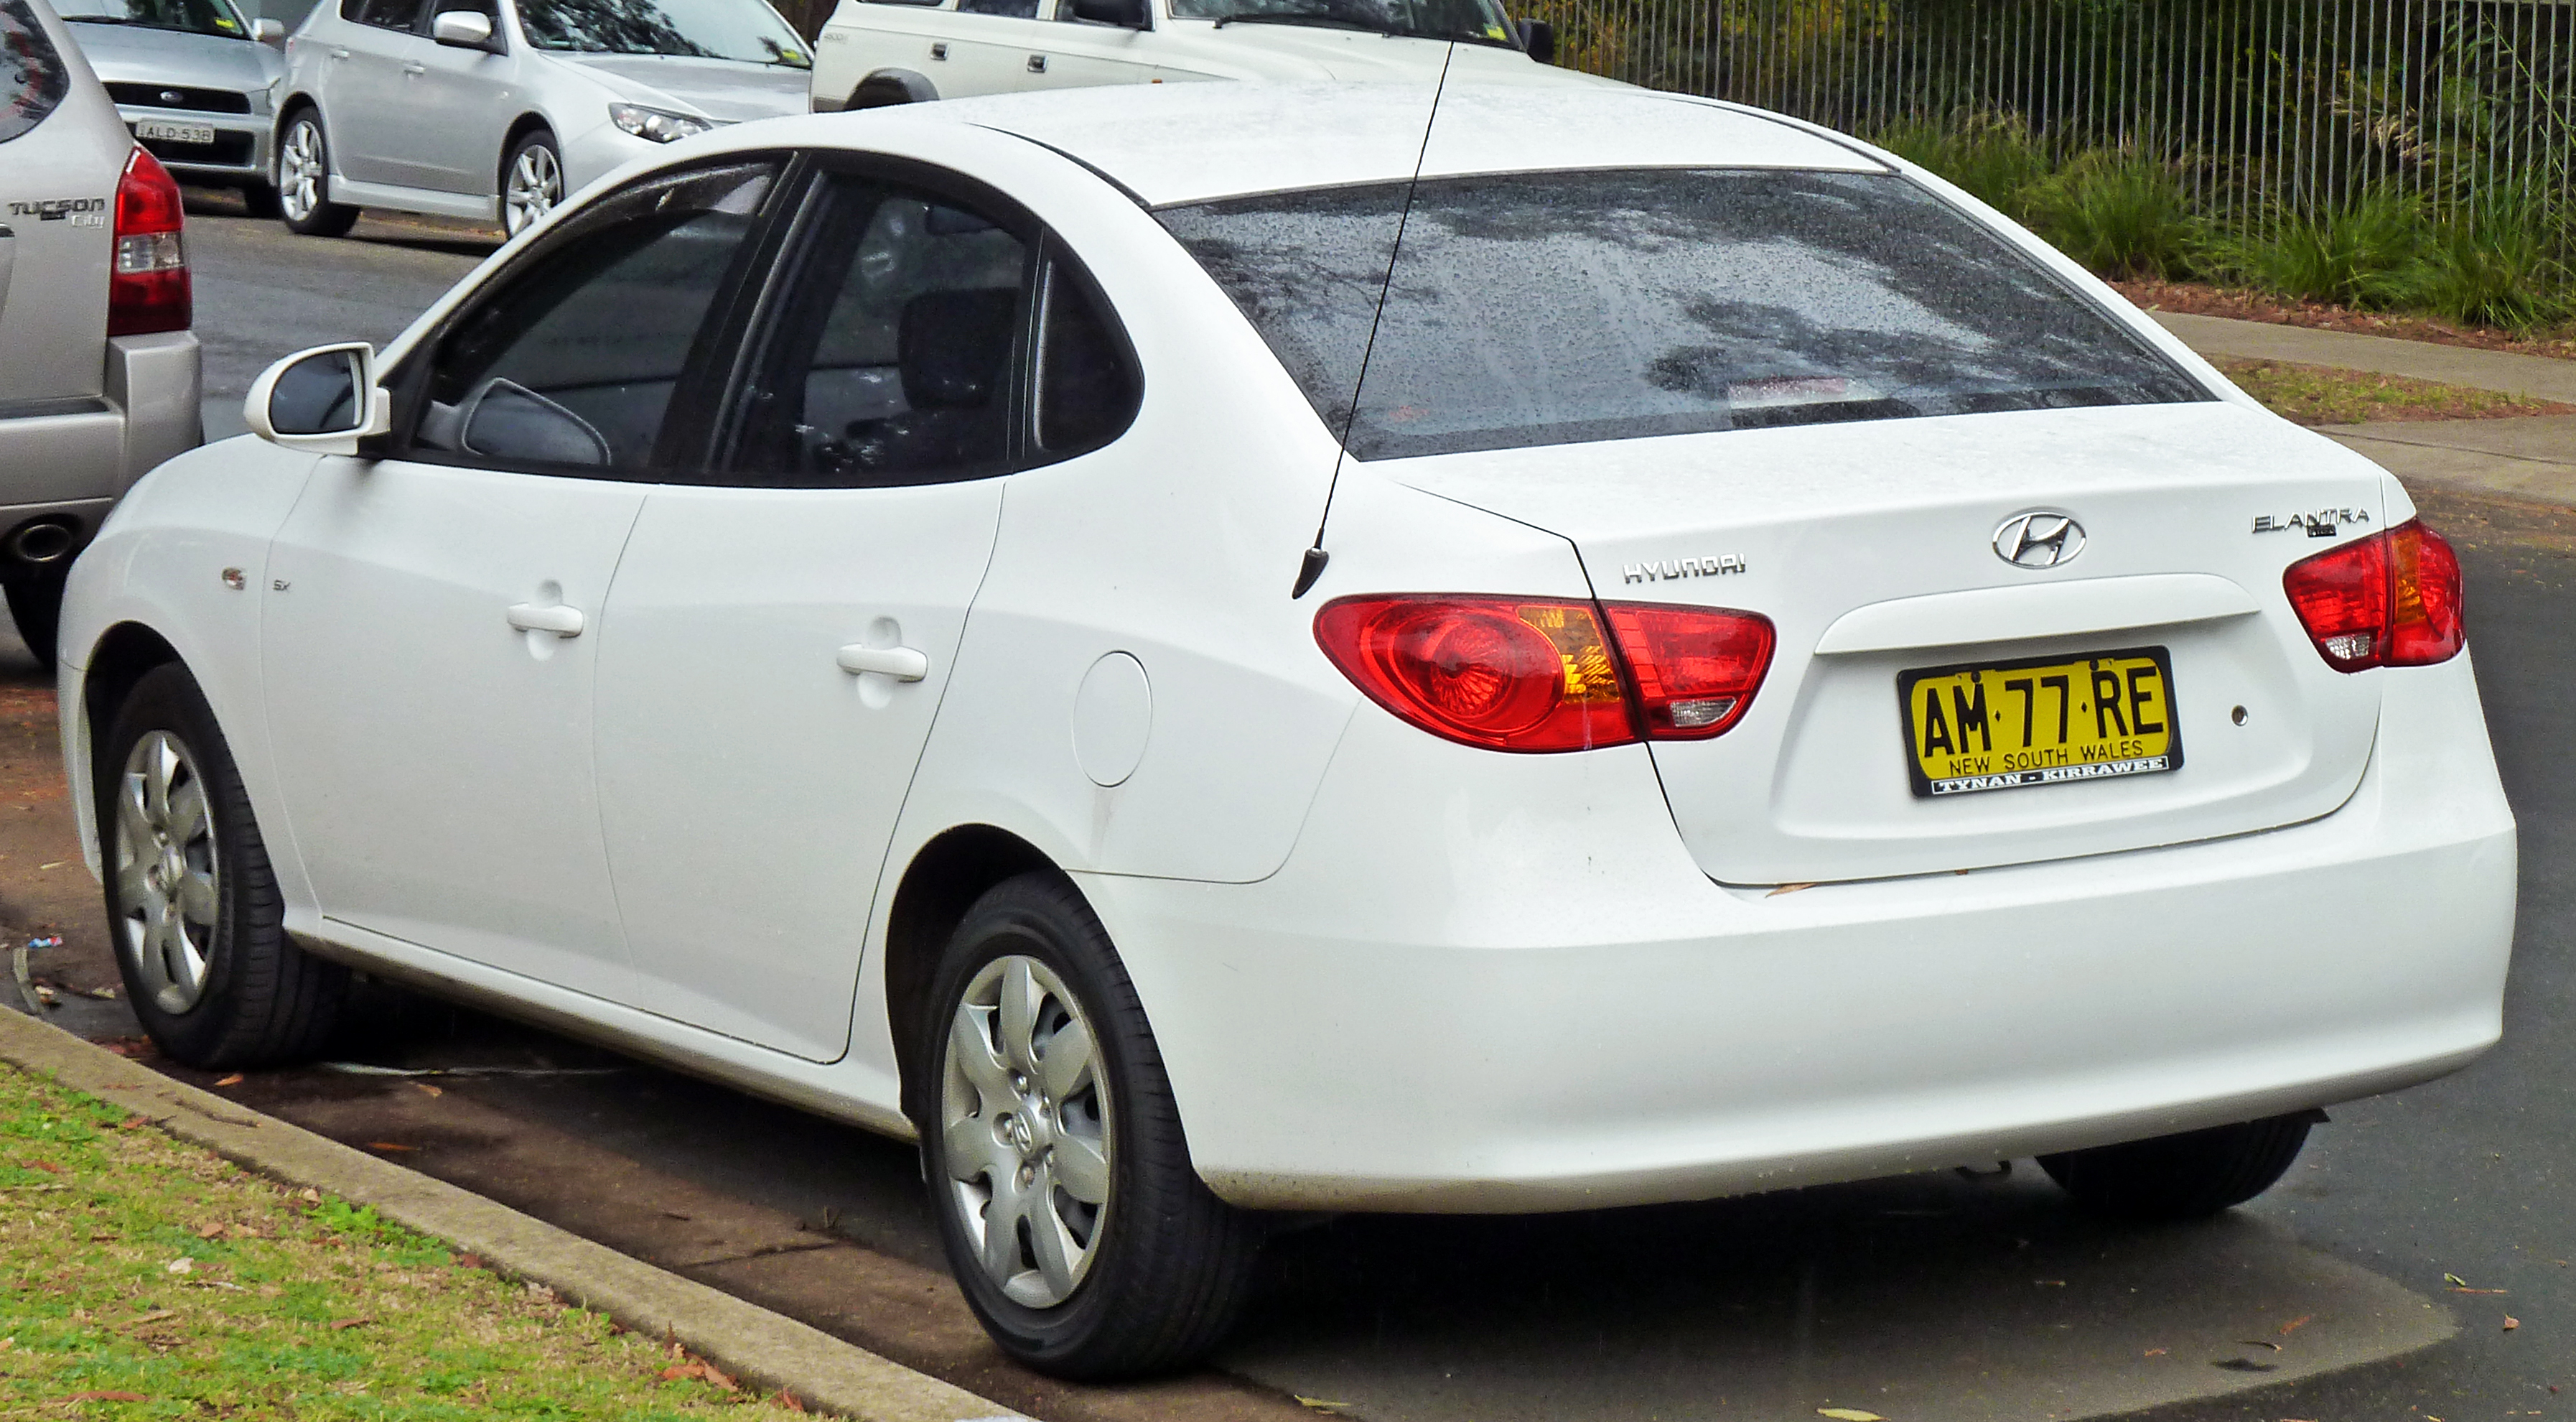 2010 hyundai elantra gls - 2010 Hyundai Elantra 20 Hyundai Elantra 20